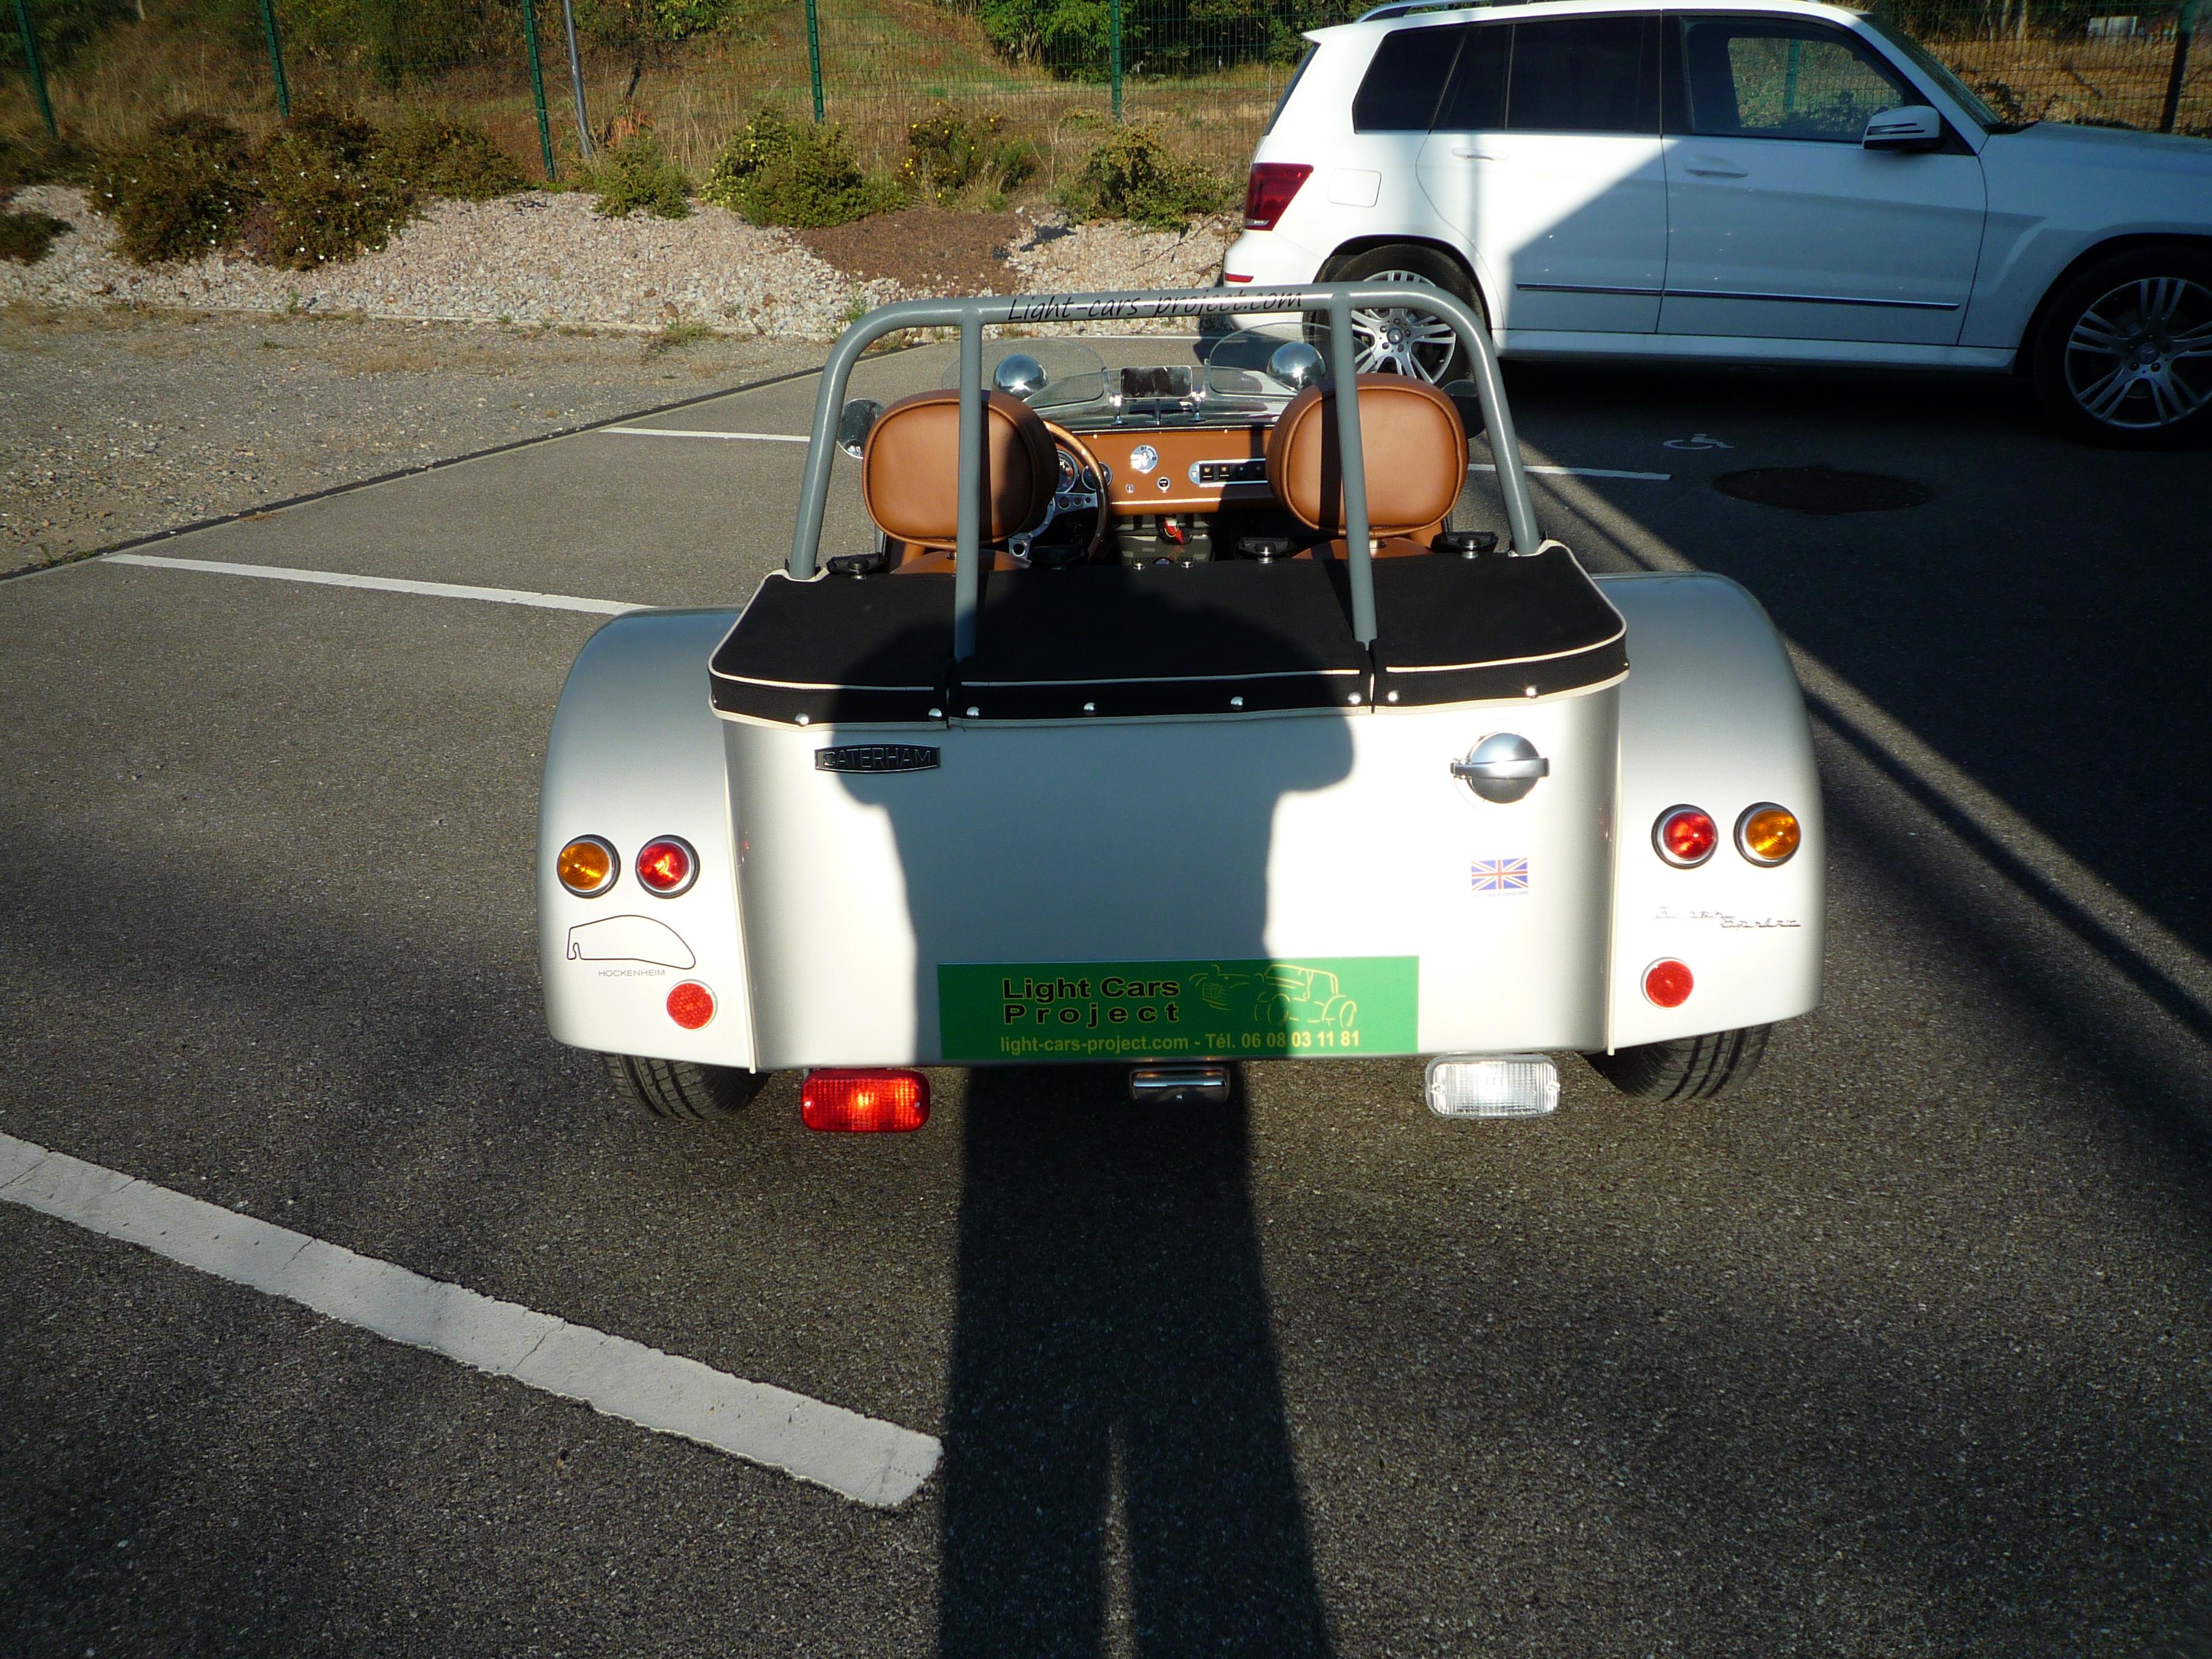 light cars project    caterham 165 super-sprint